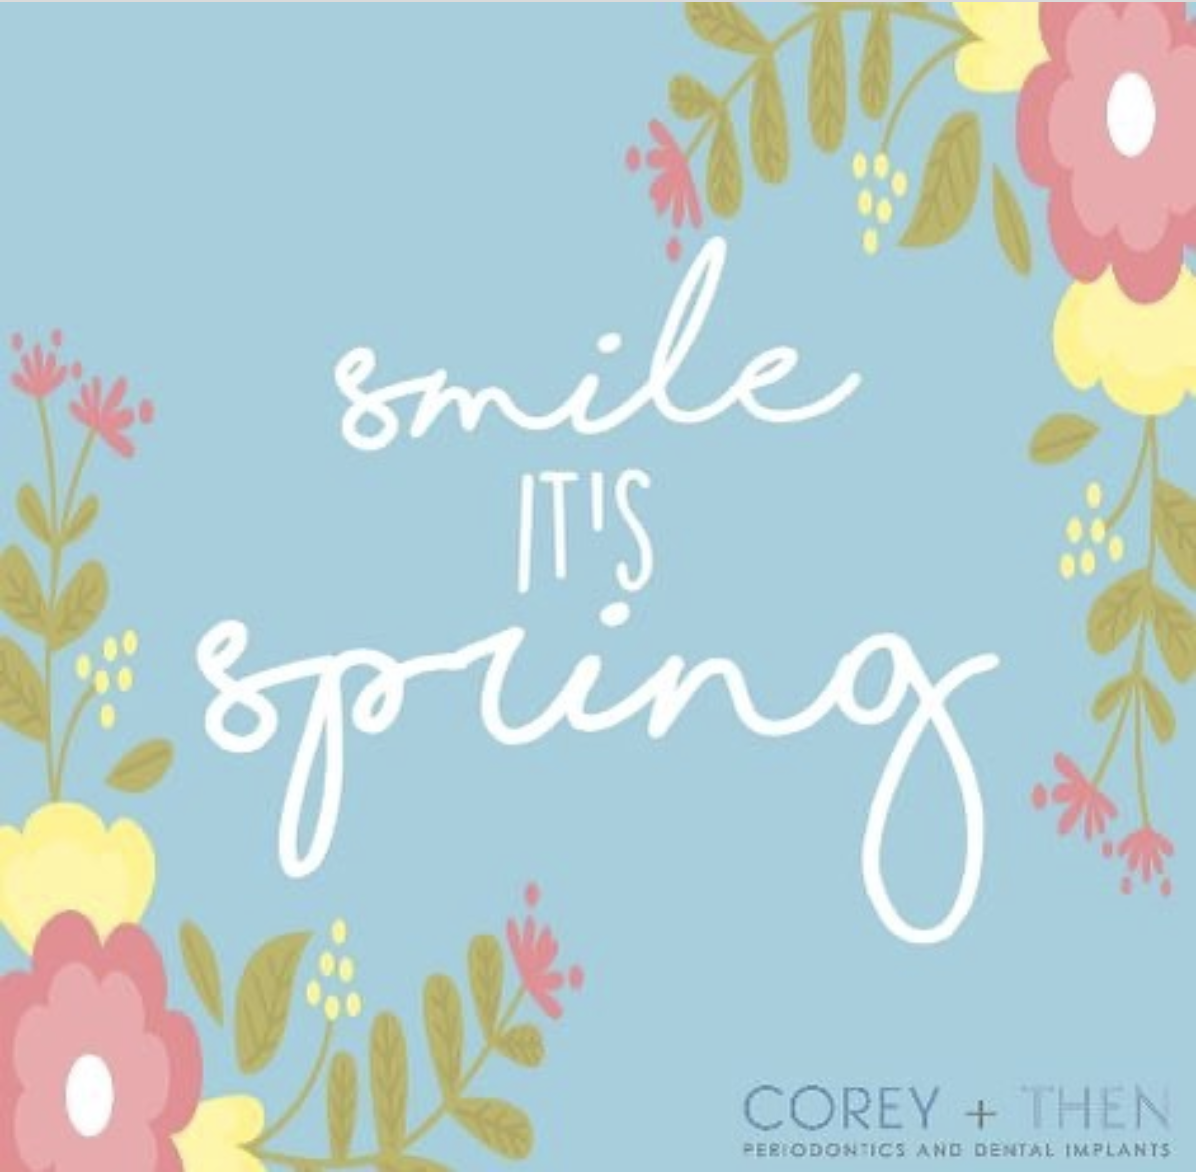 Smile It's Spring: Corey + Then